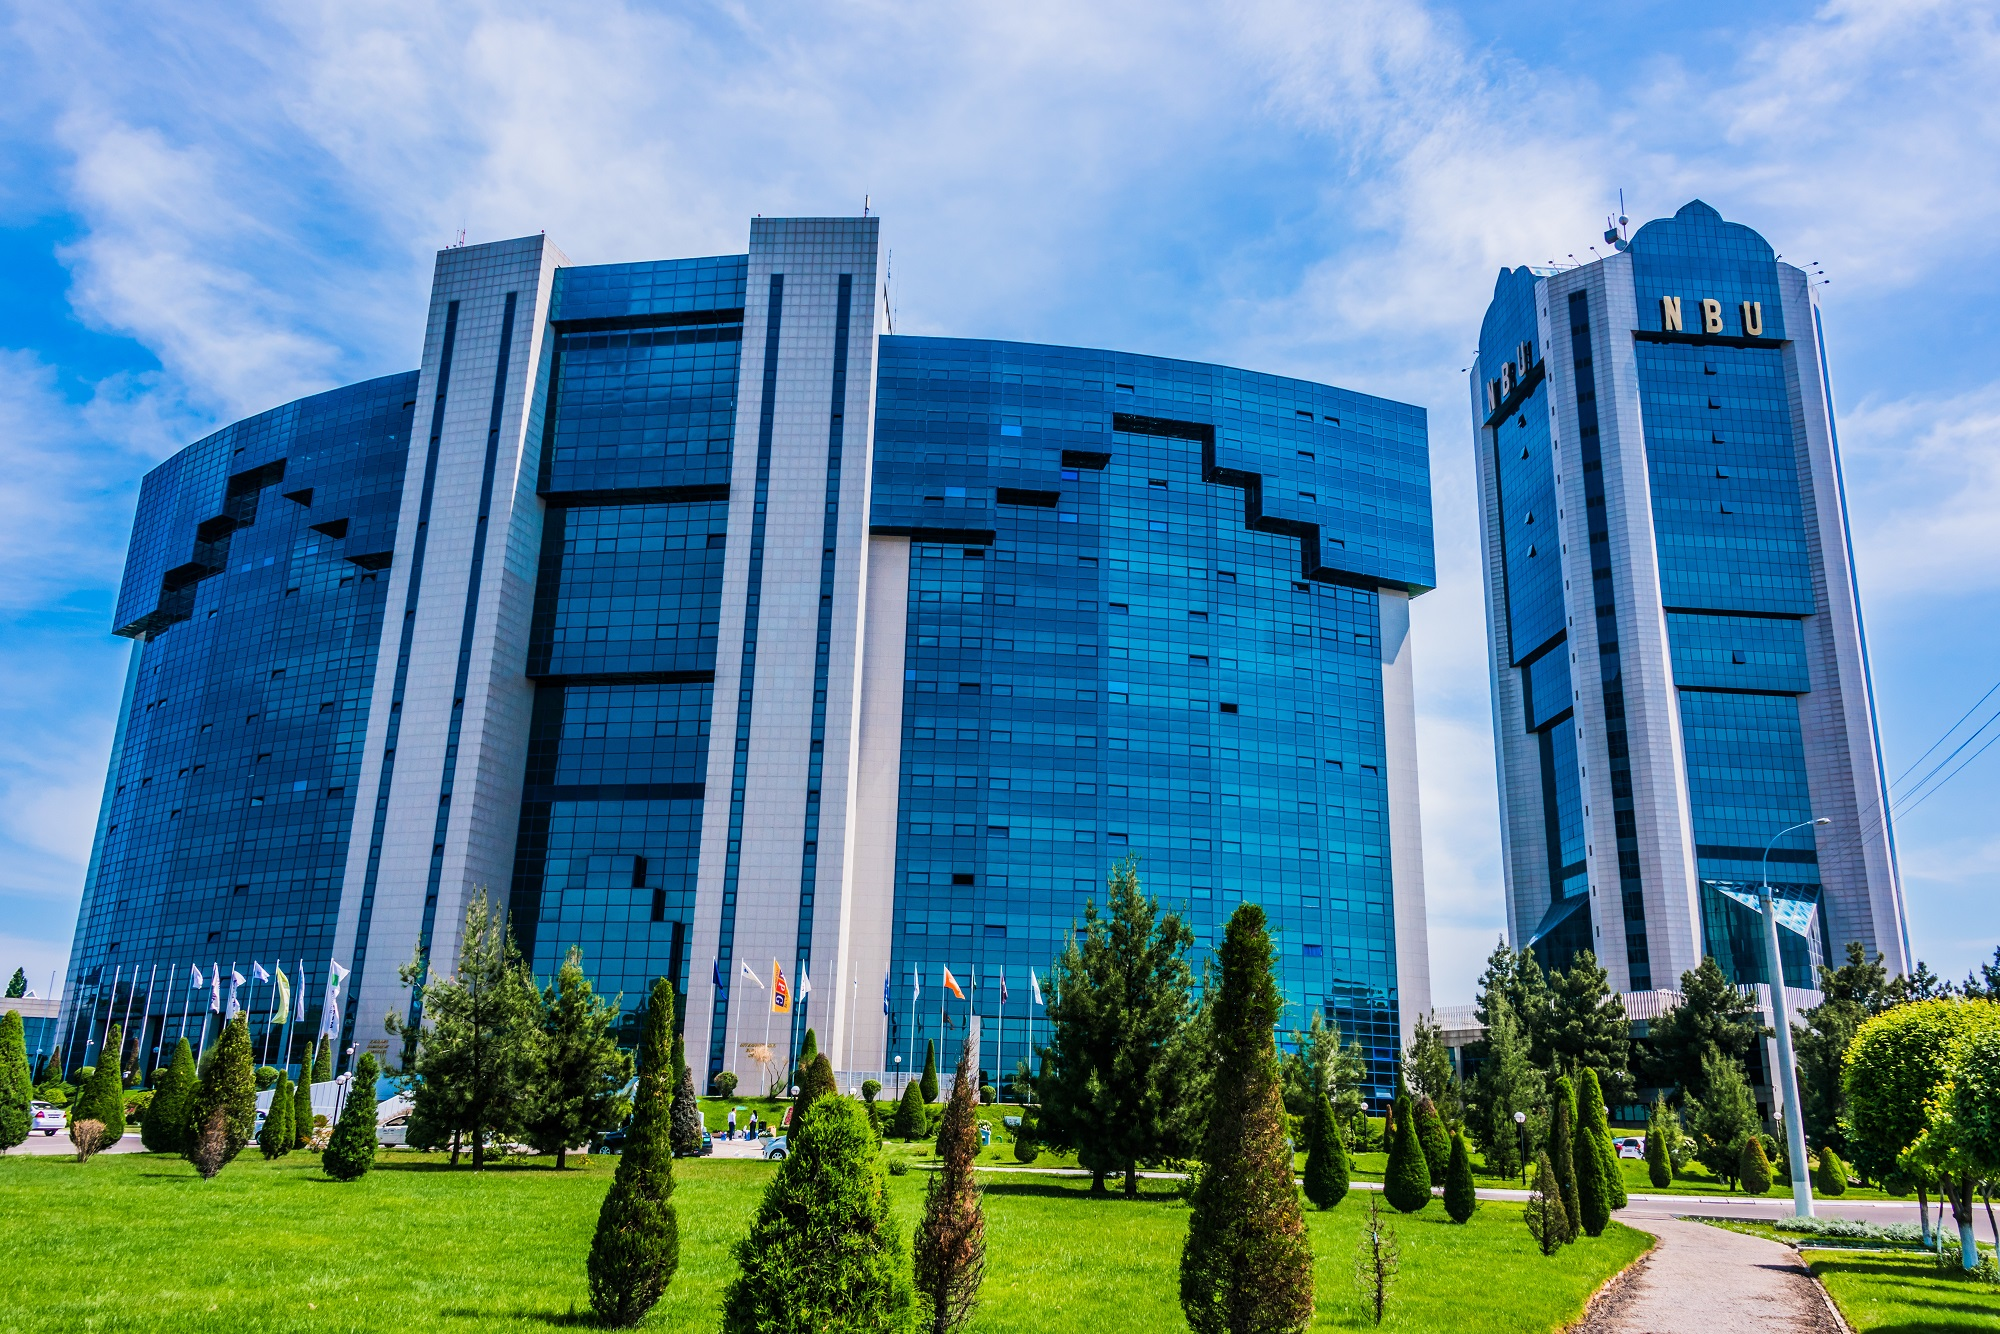 TASHKENT, UZBEKISTAN - APR 29, 2019: International Business Center in Taskent, Uzbekistan